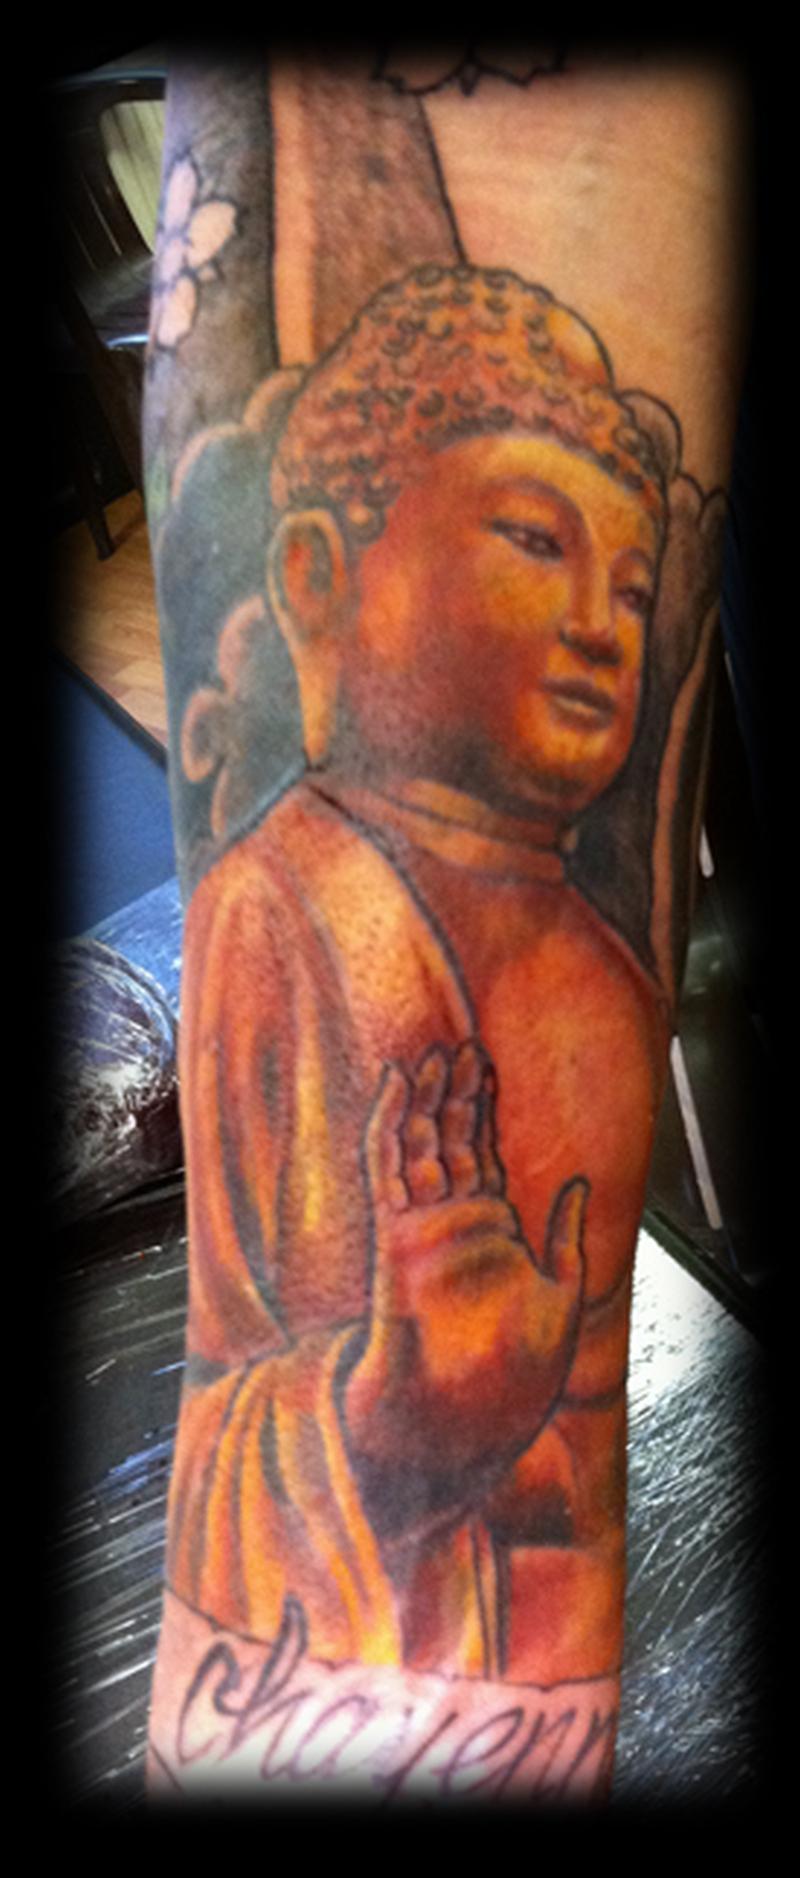 Charming buddha religious tattoo design